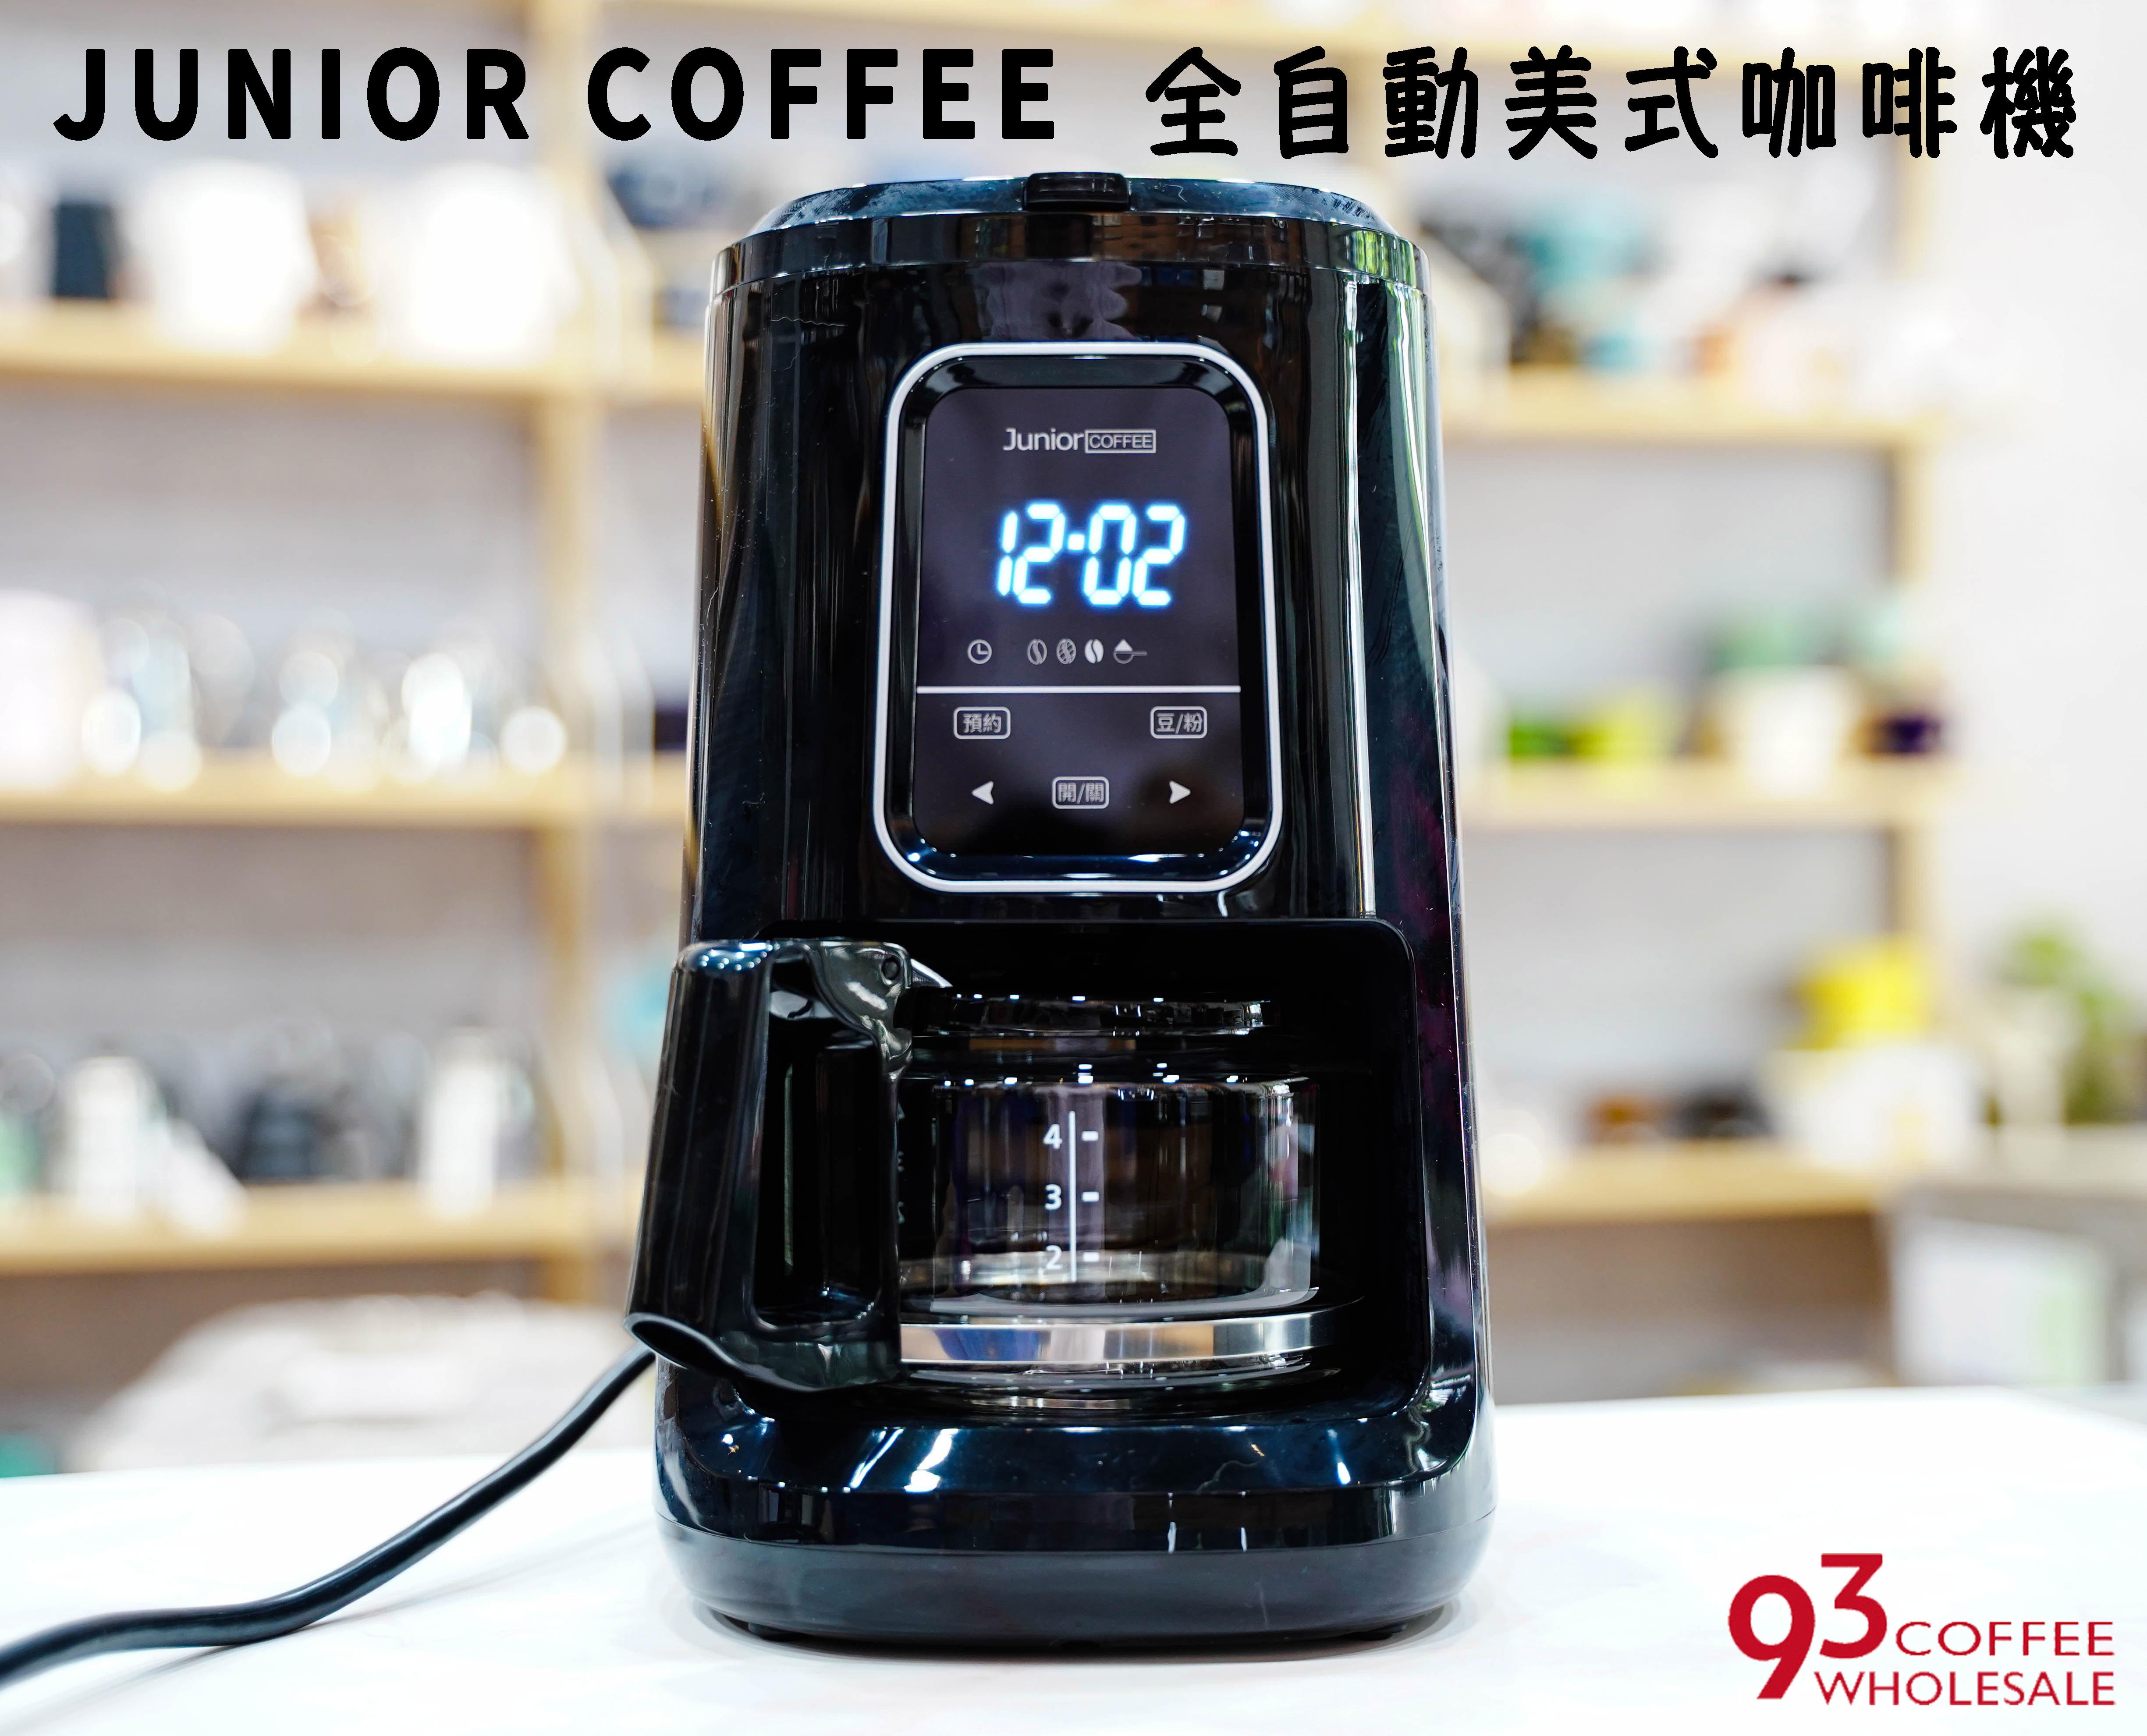 JUNIOR 全自動美式咖啡機 豆 / 粉兩用 可定時預約沖煮 贈咖啡豆 『93 coffee wholesale』 0